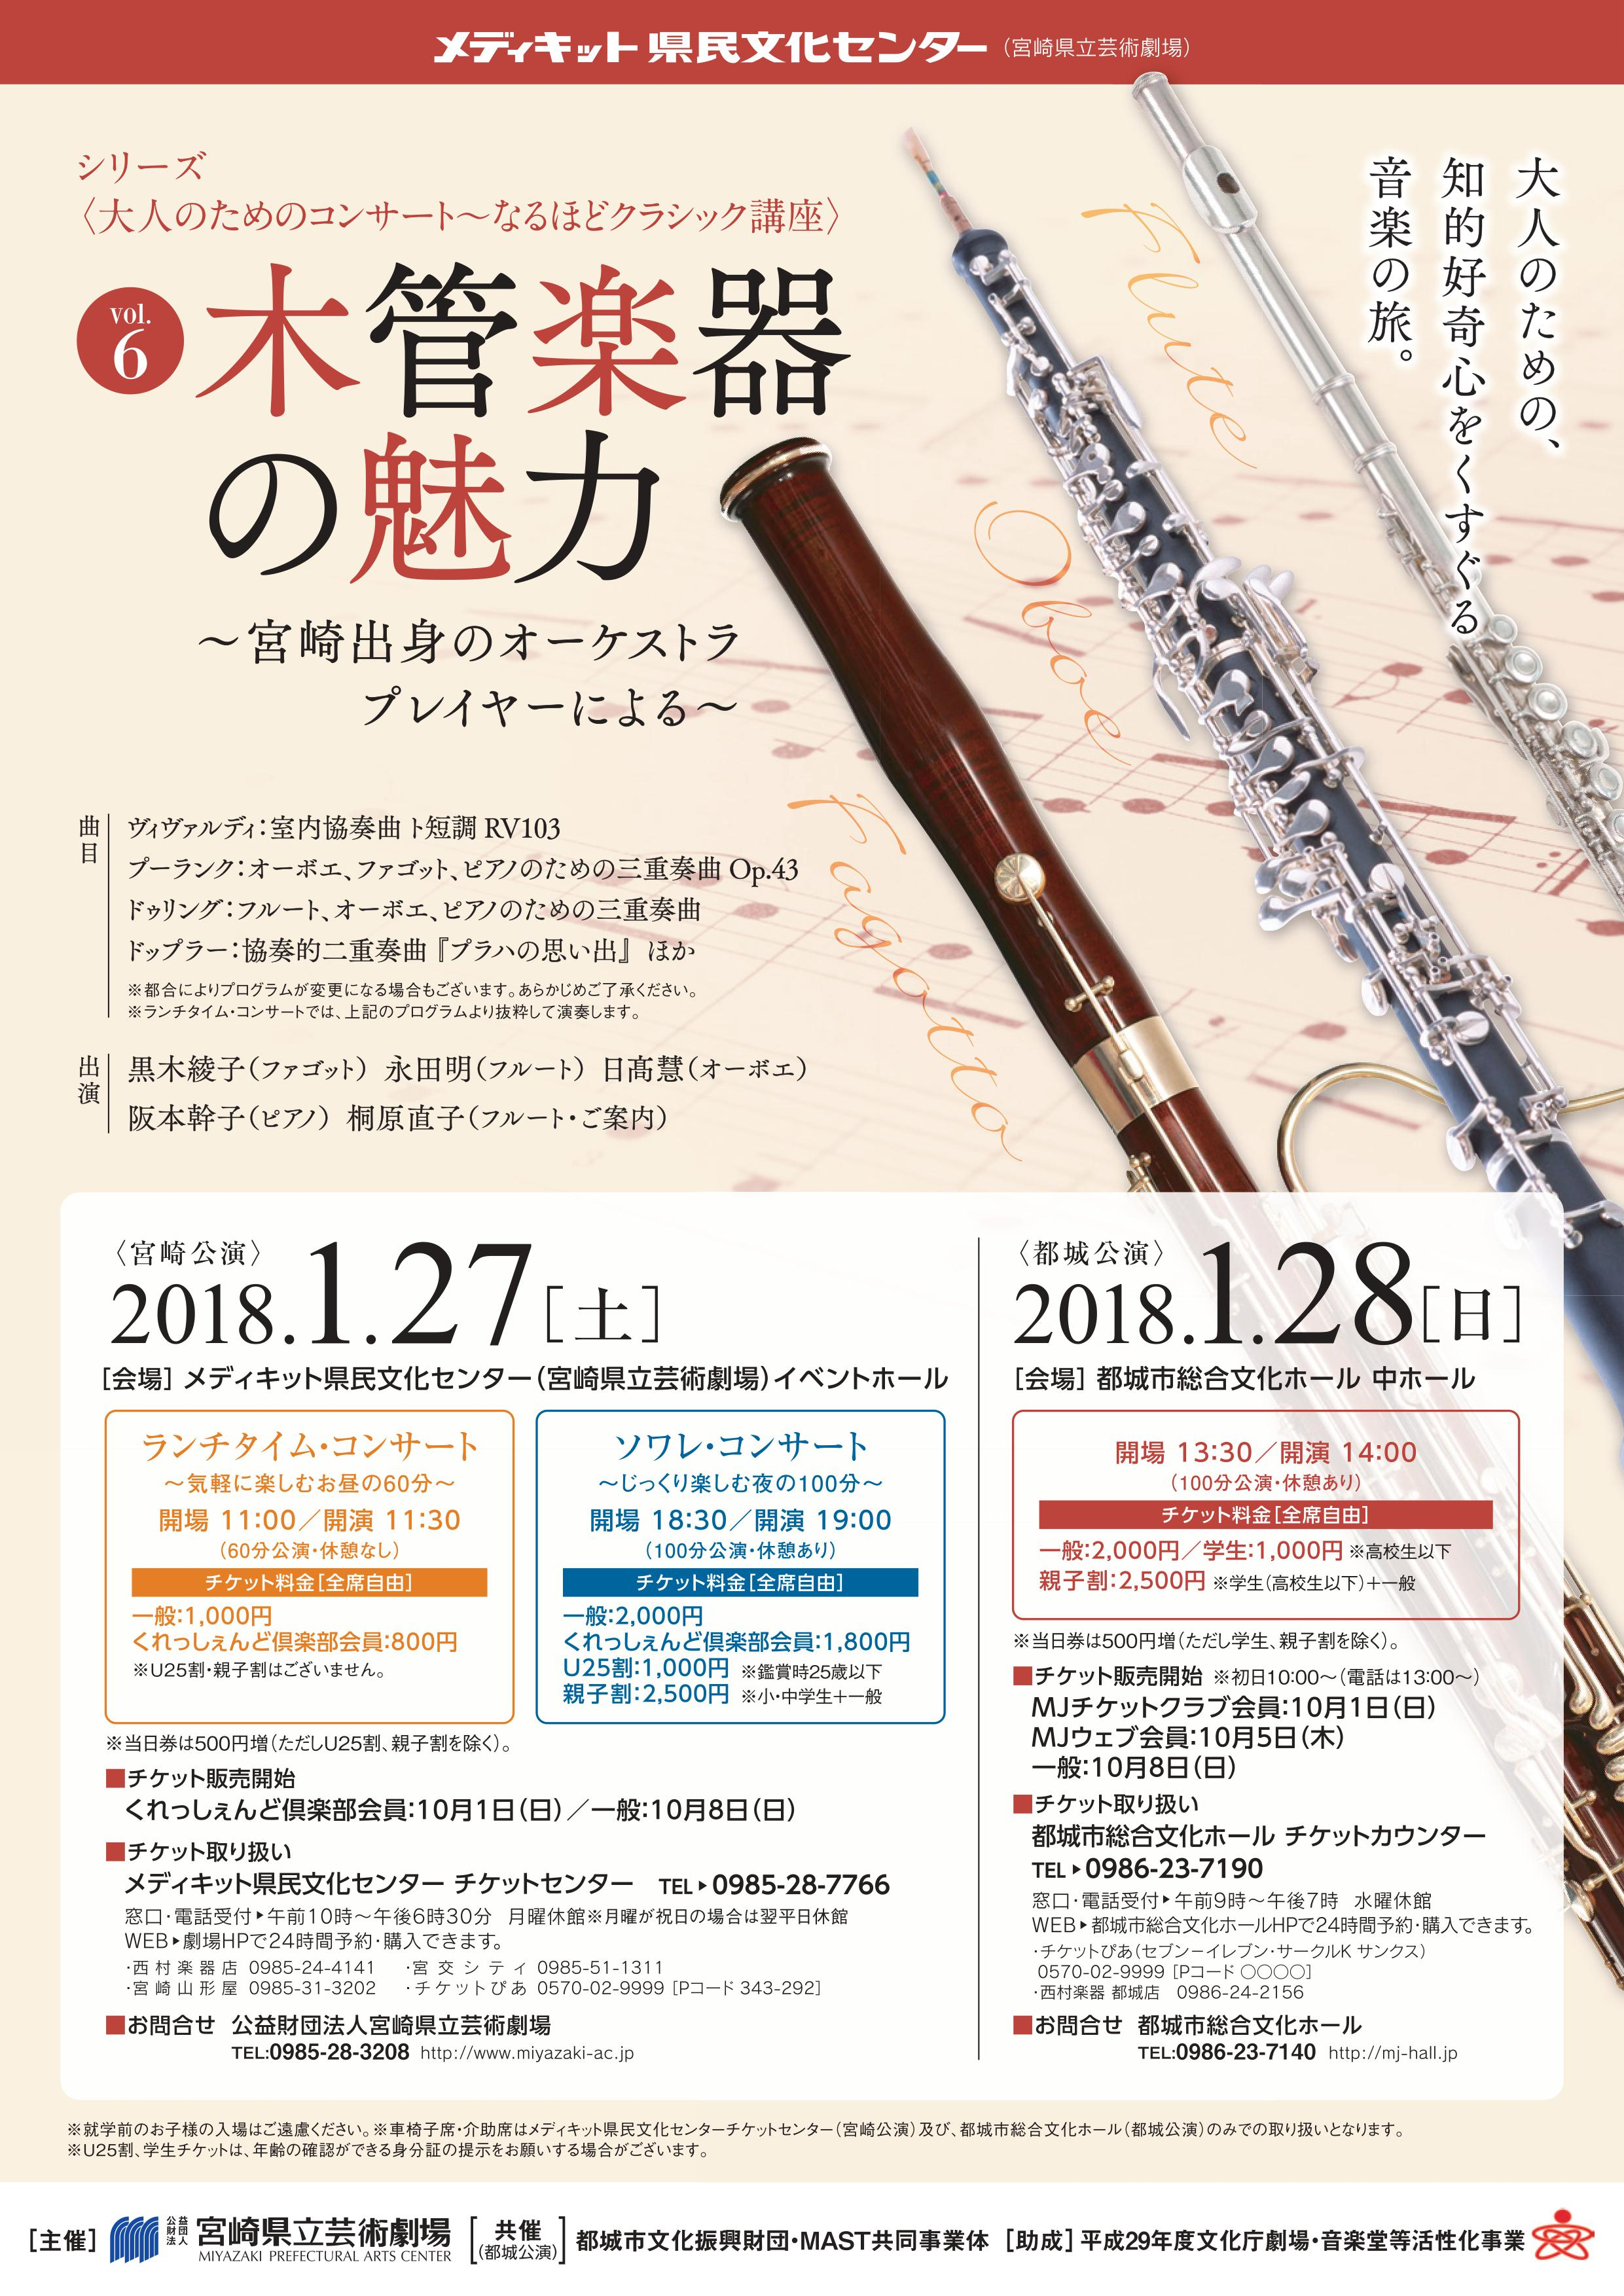 http://mj-hall.jp/performance/300128tirashi1.jpg